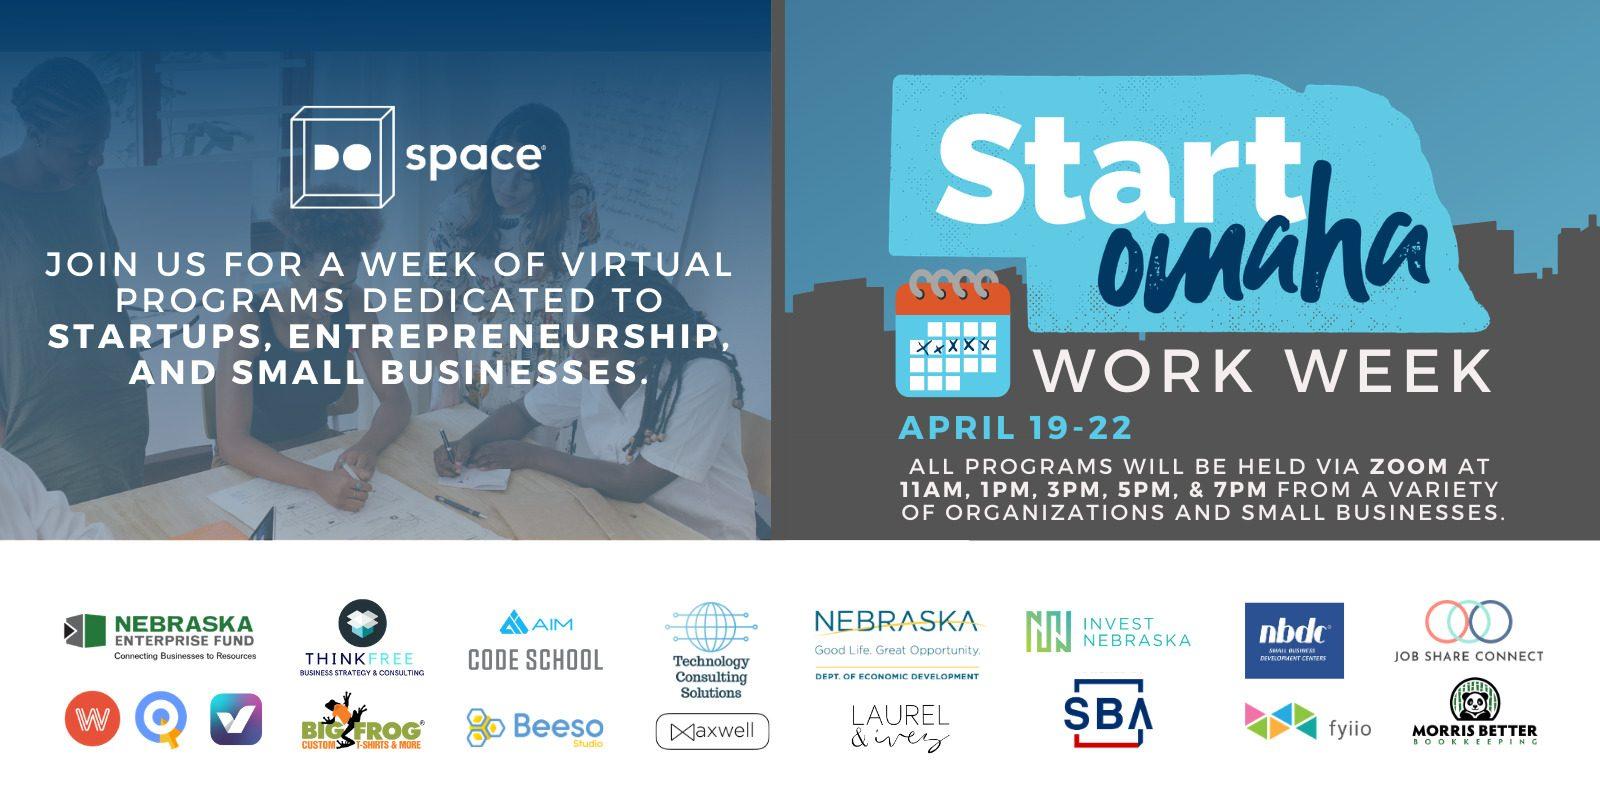 2021 Start Omaha Work Week